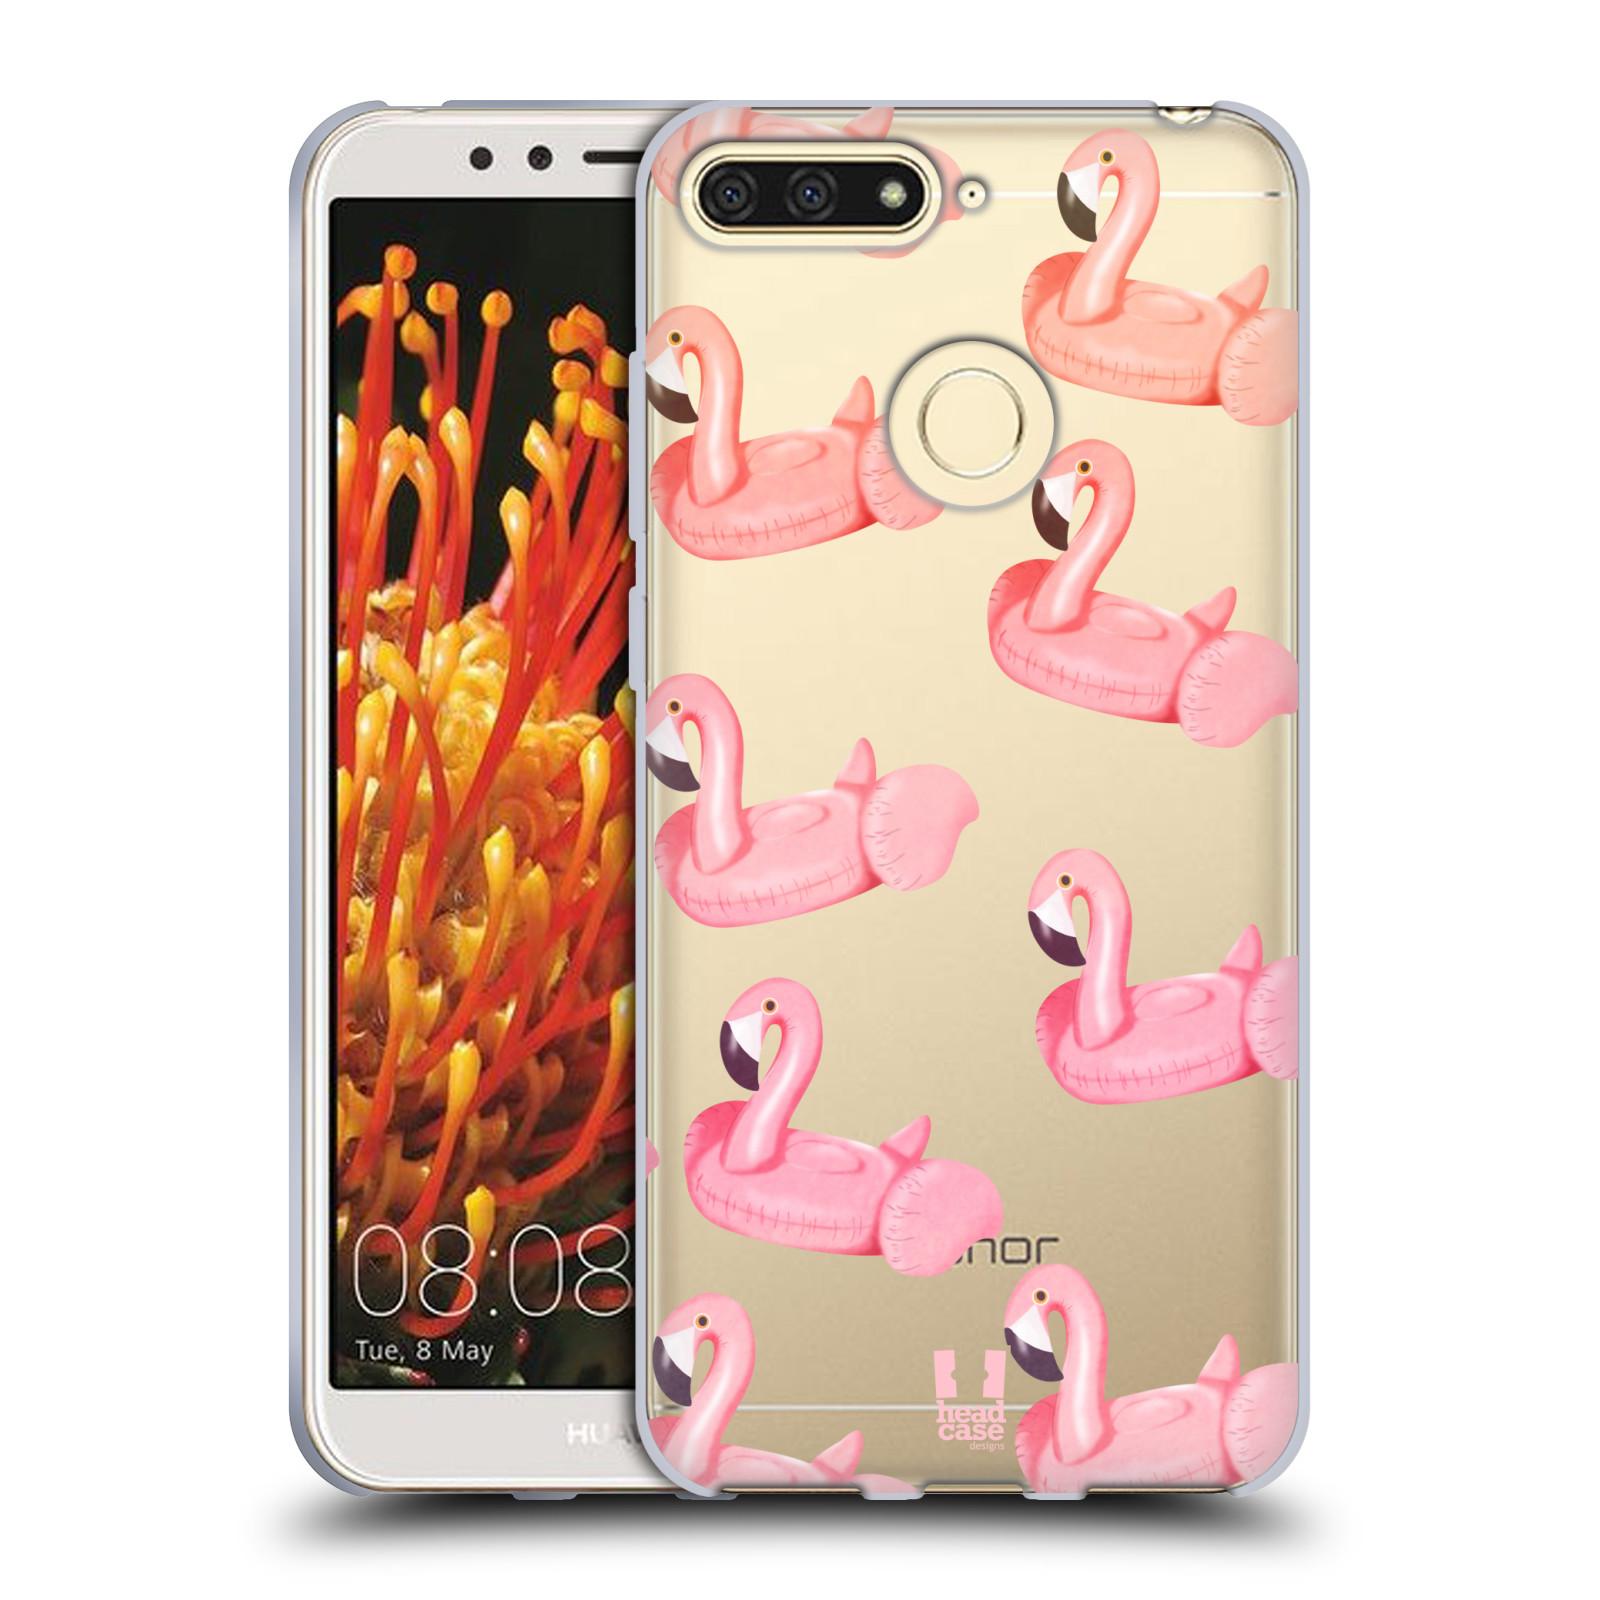 Silikonové pouzdro na mobil Huawei Y6 Prime (2018) - Head Case - Kruh plaměňák